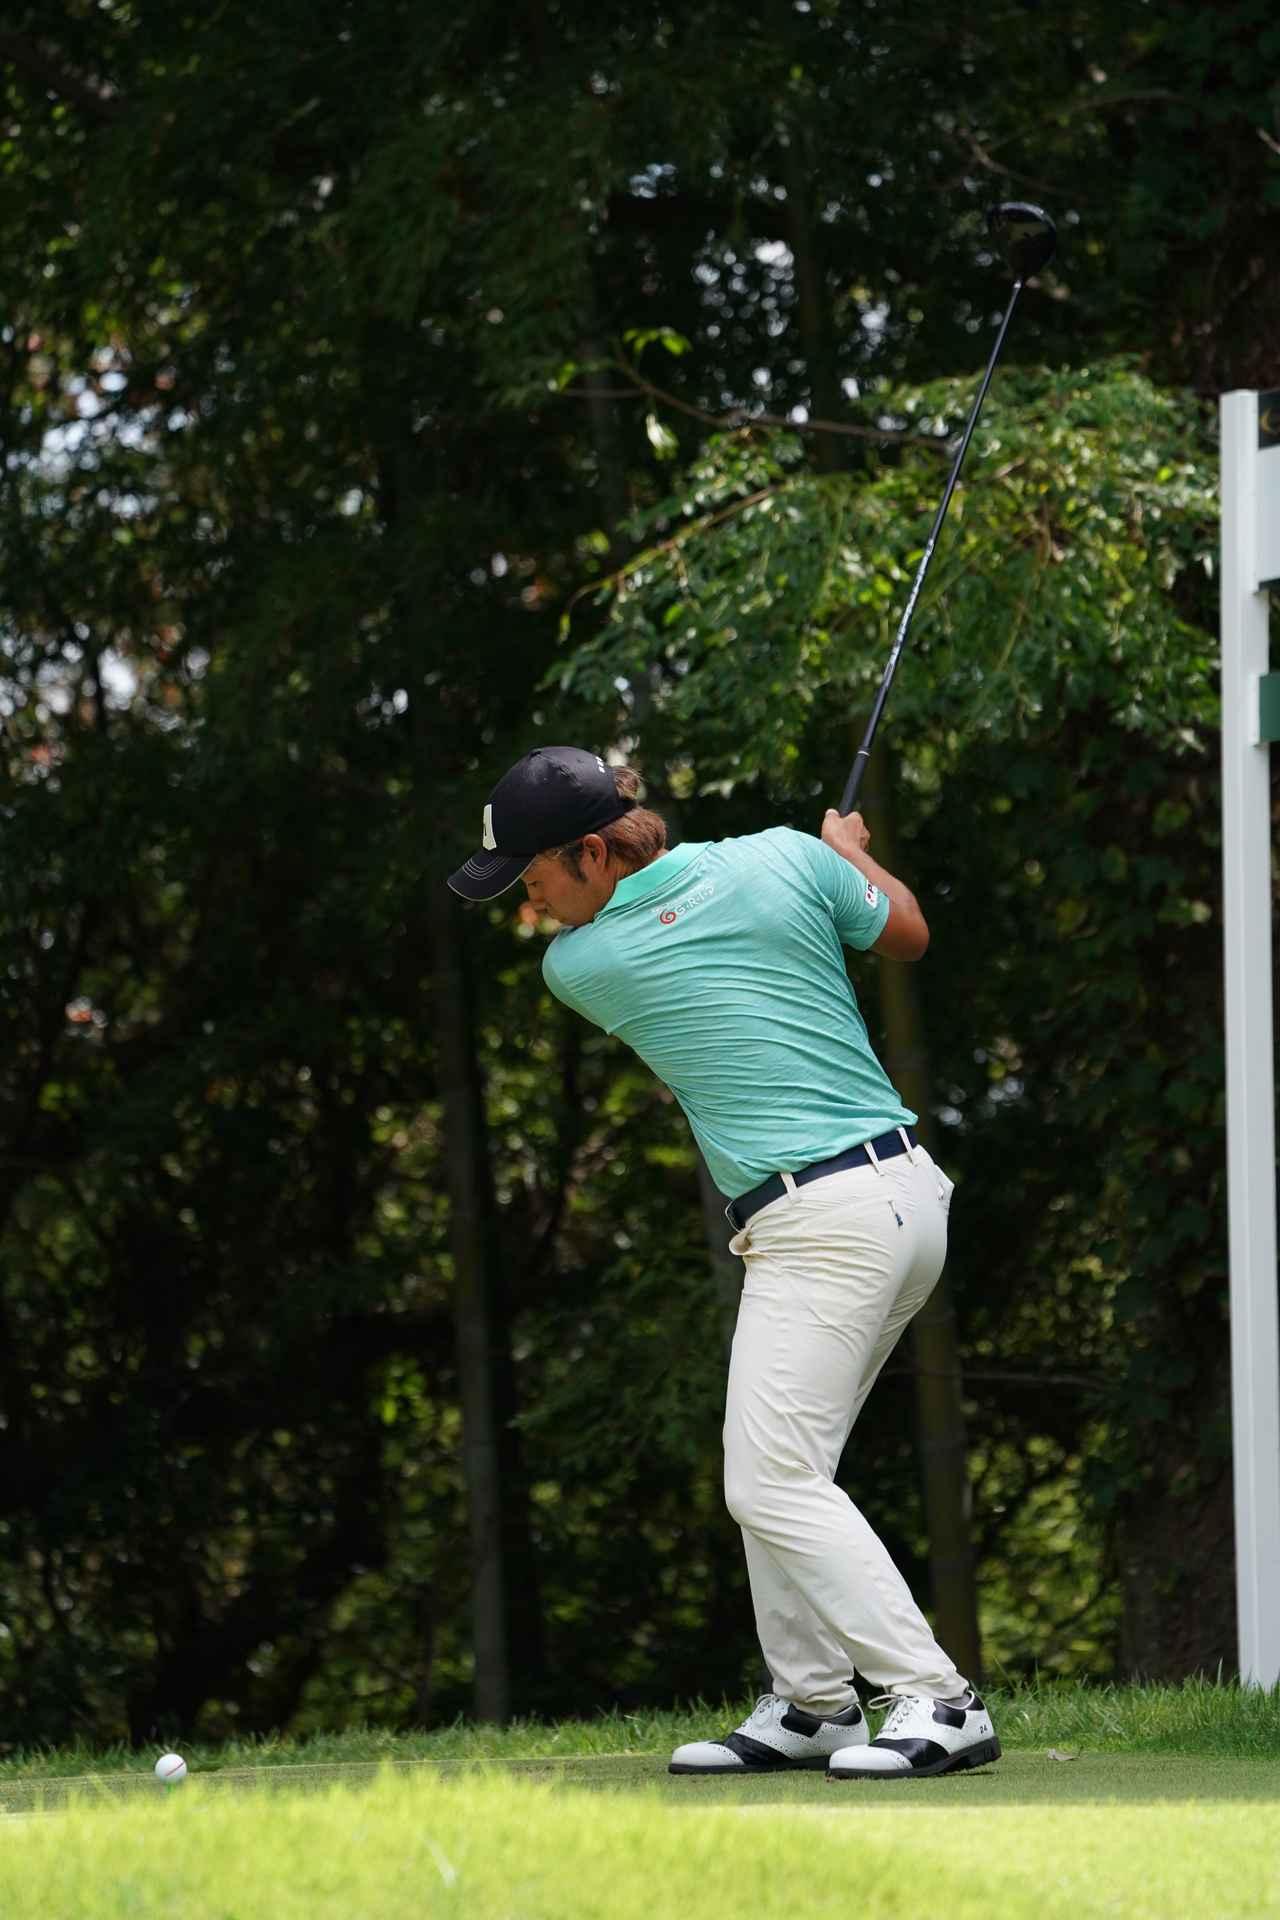 Images : 3番目の画像 - 浅地洋佑のドライバー連続写真 - みんなのゴルフダイジェスト